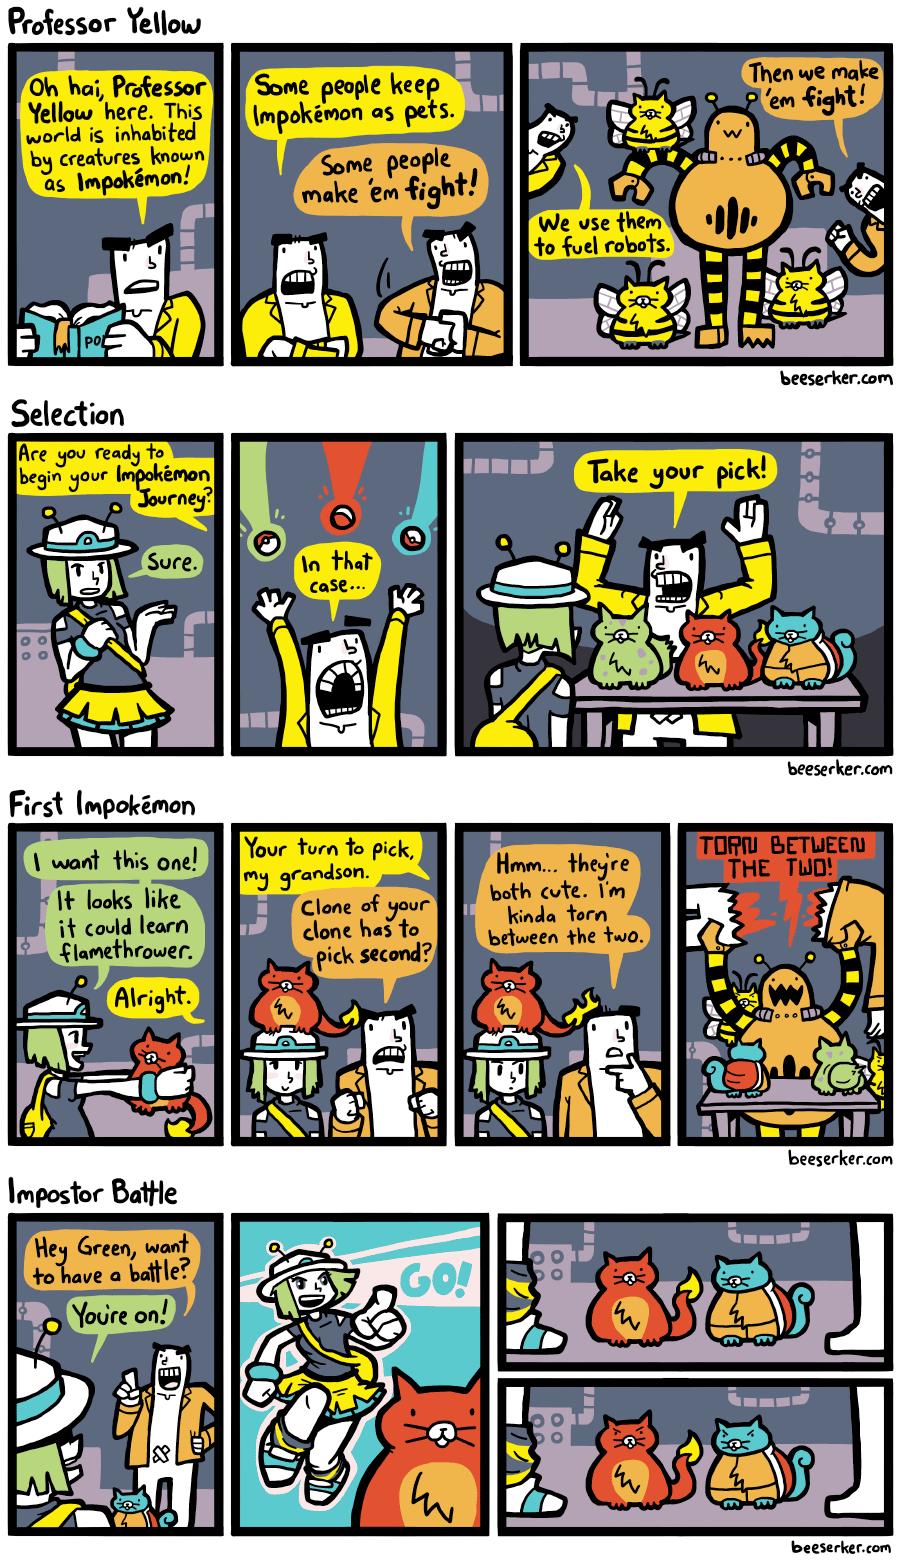 Professor Yellow